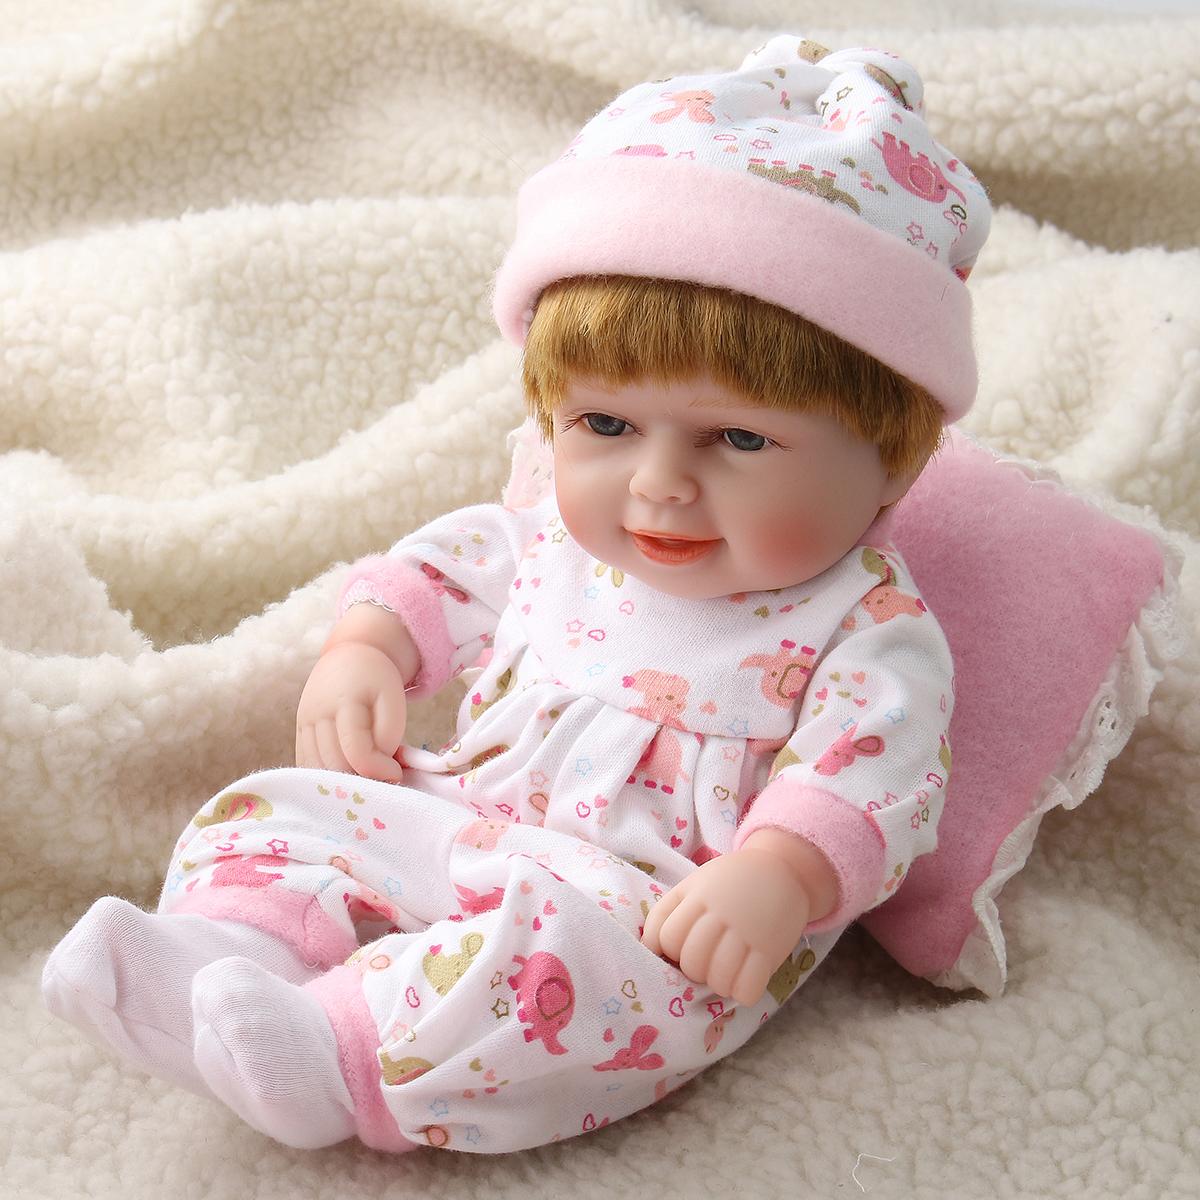 11inch Reborn Baby Doll Girl Silicone Handmade Lifelike Baby Dolls Play House Bath Toys